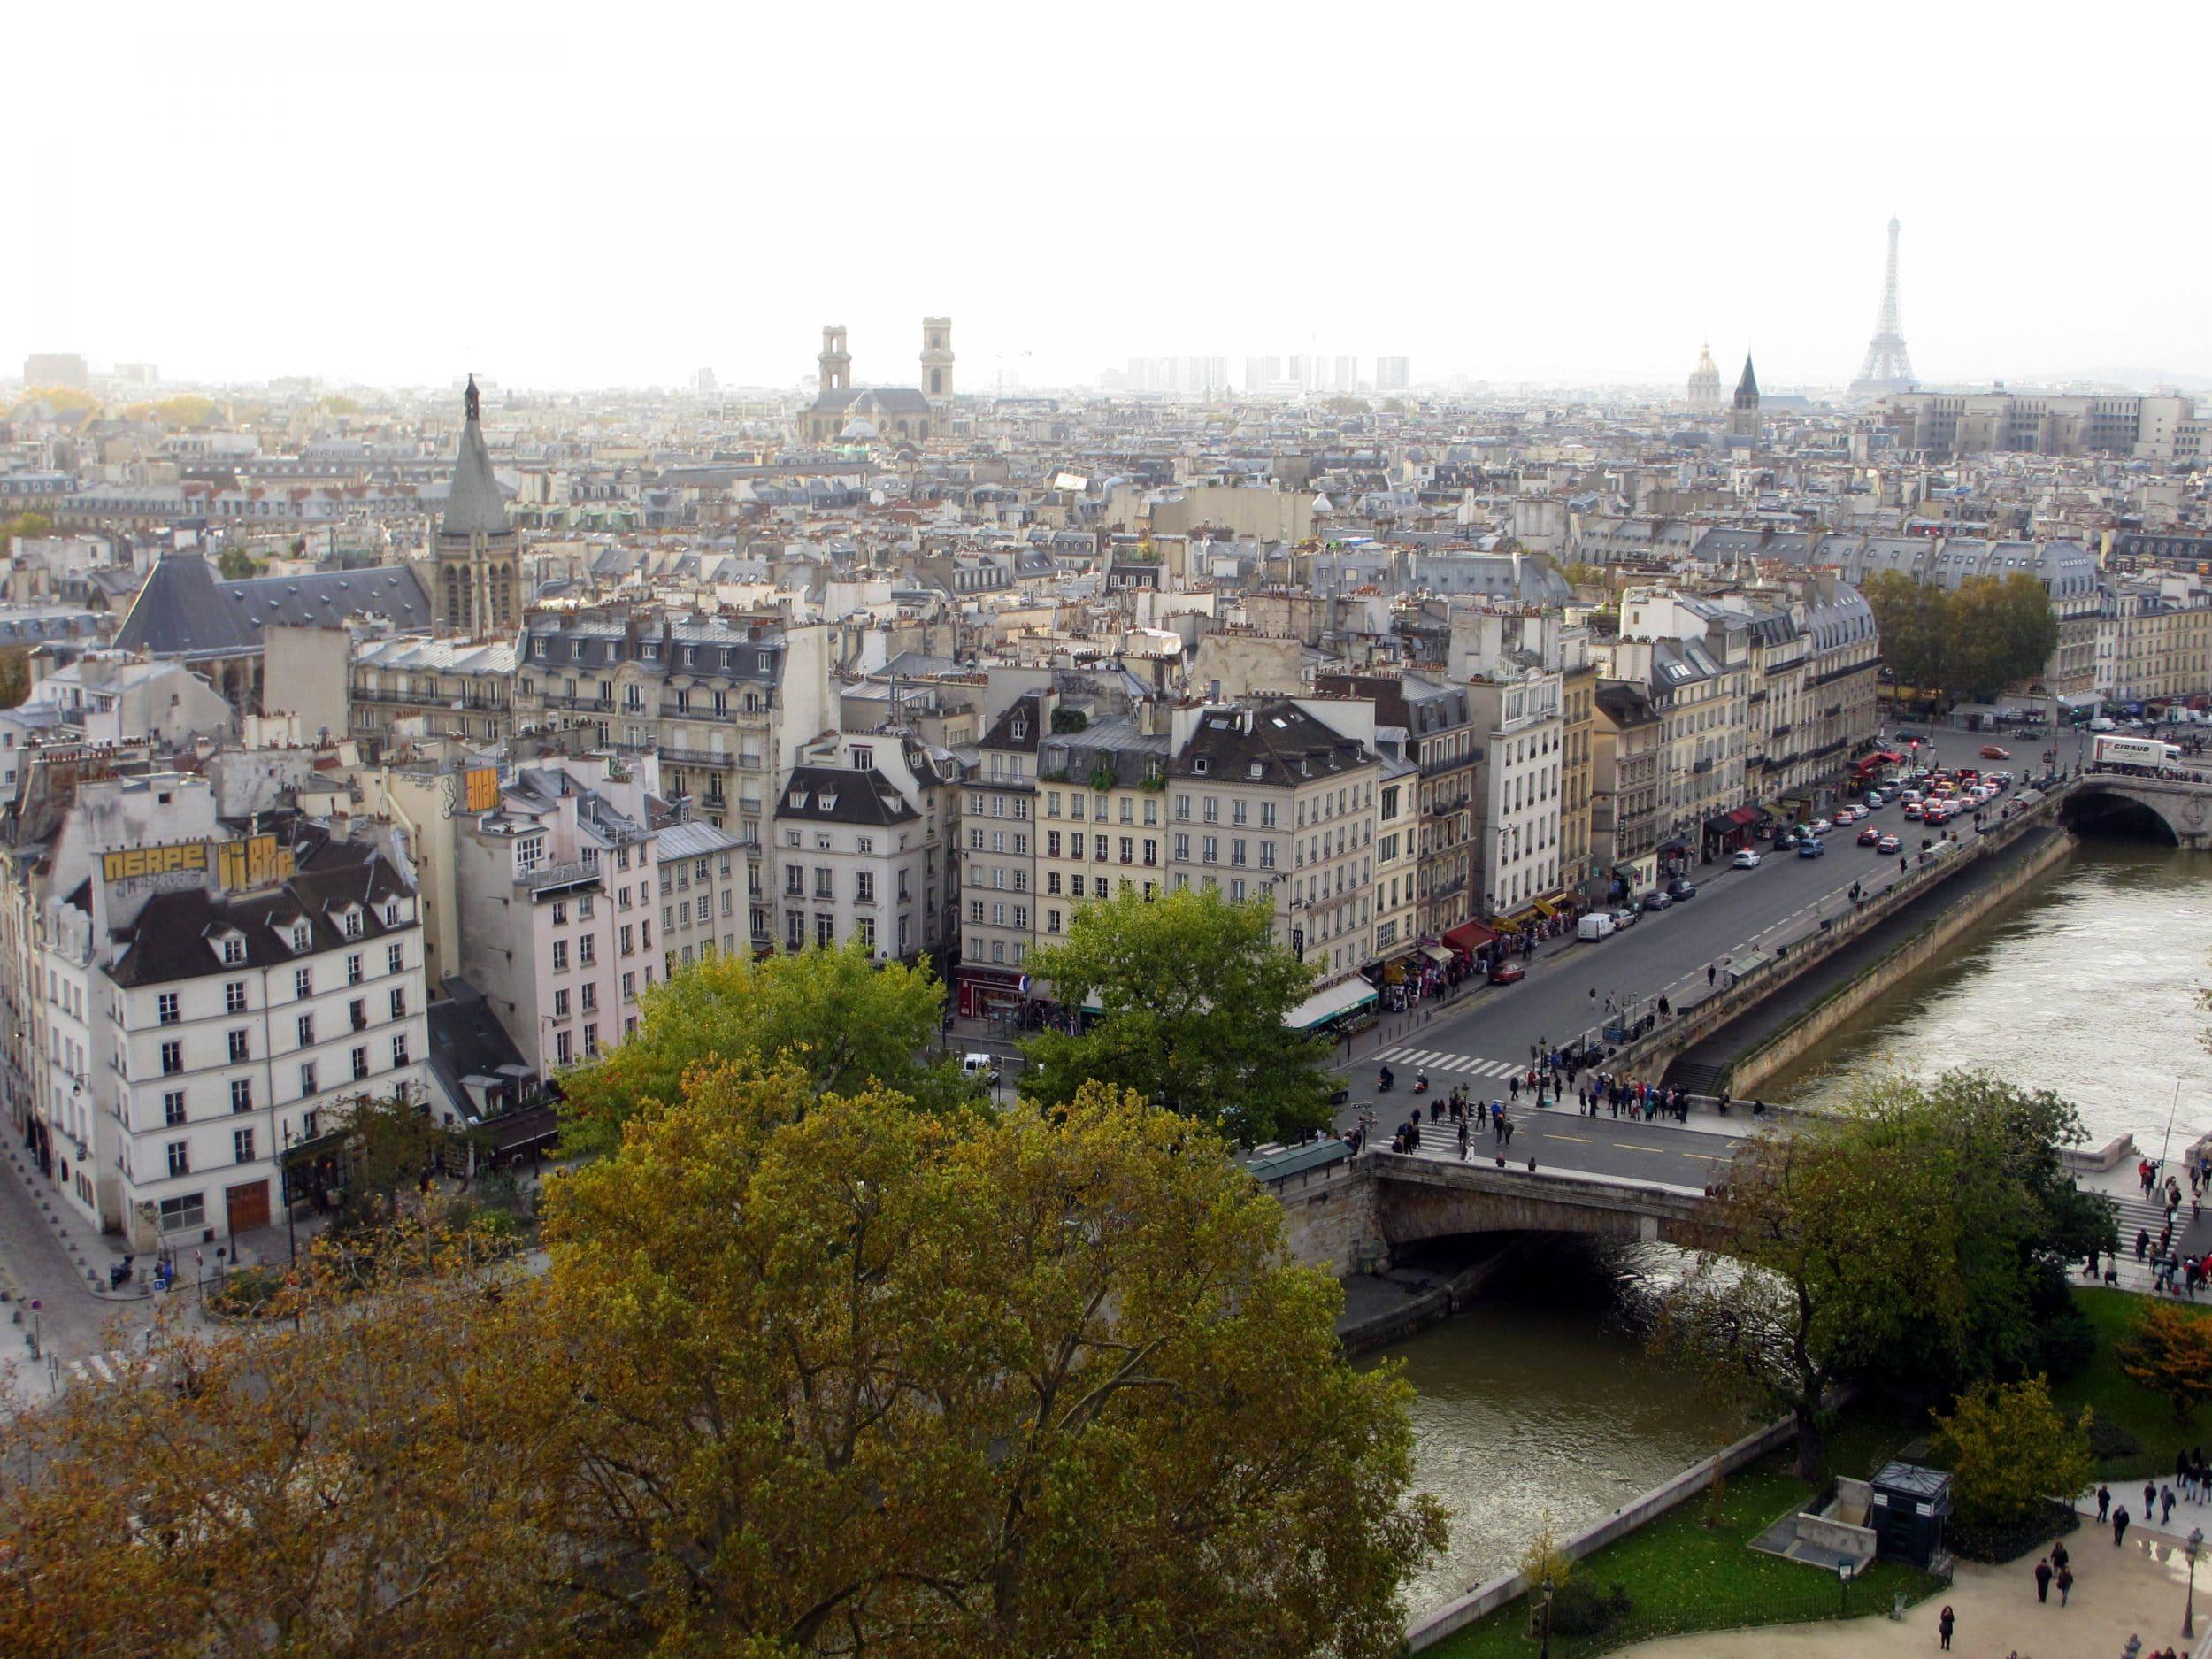 Sightseeing in Paris via Wayfaring With Wagner